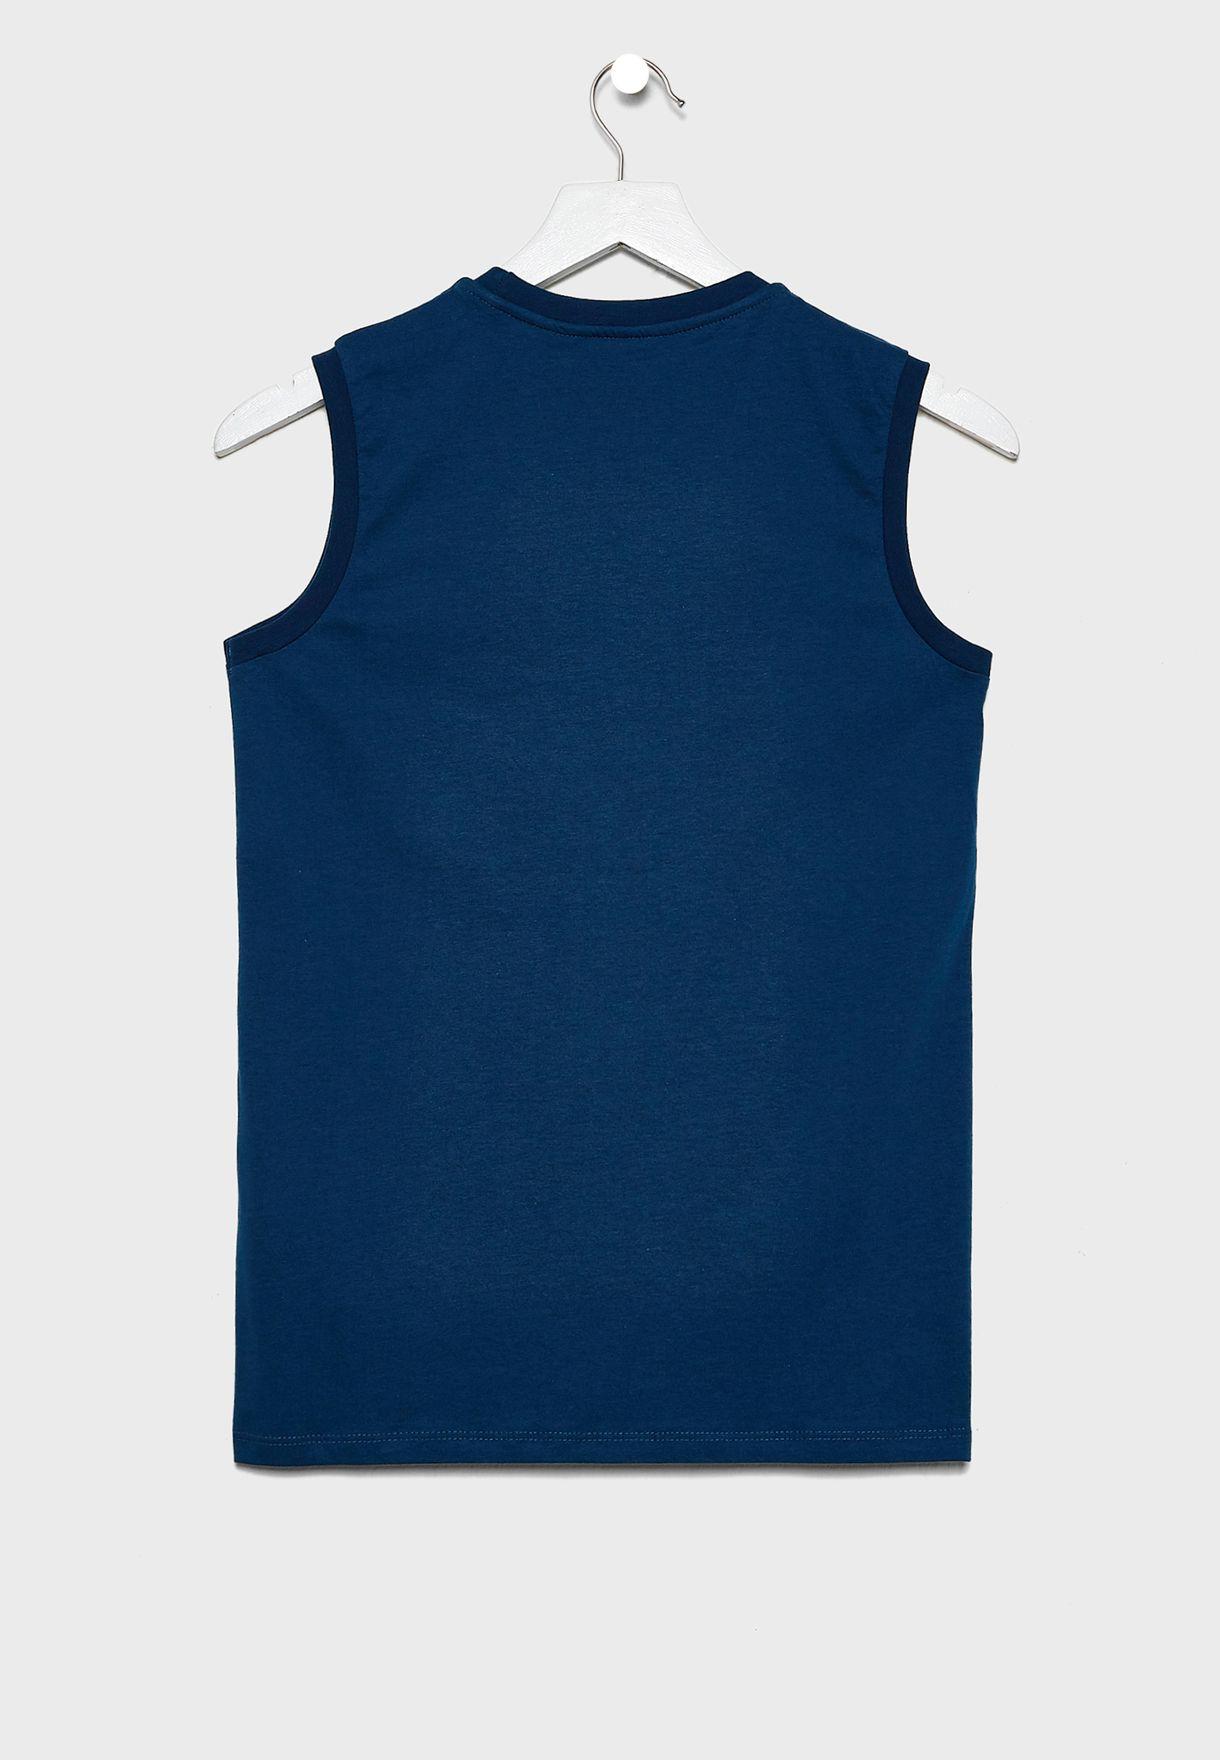 Kids Aqua Vest